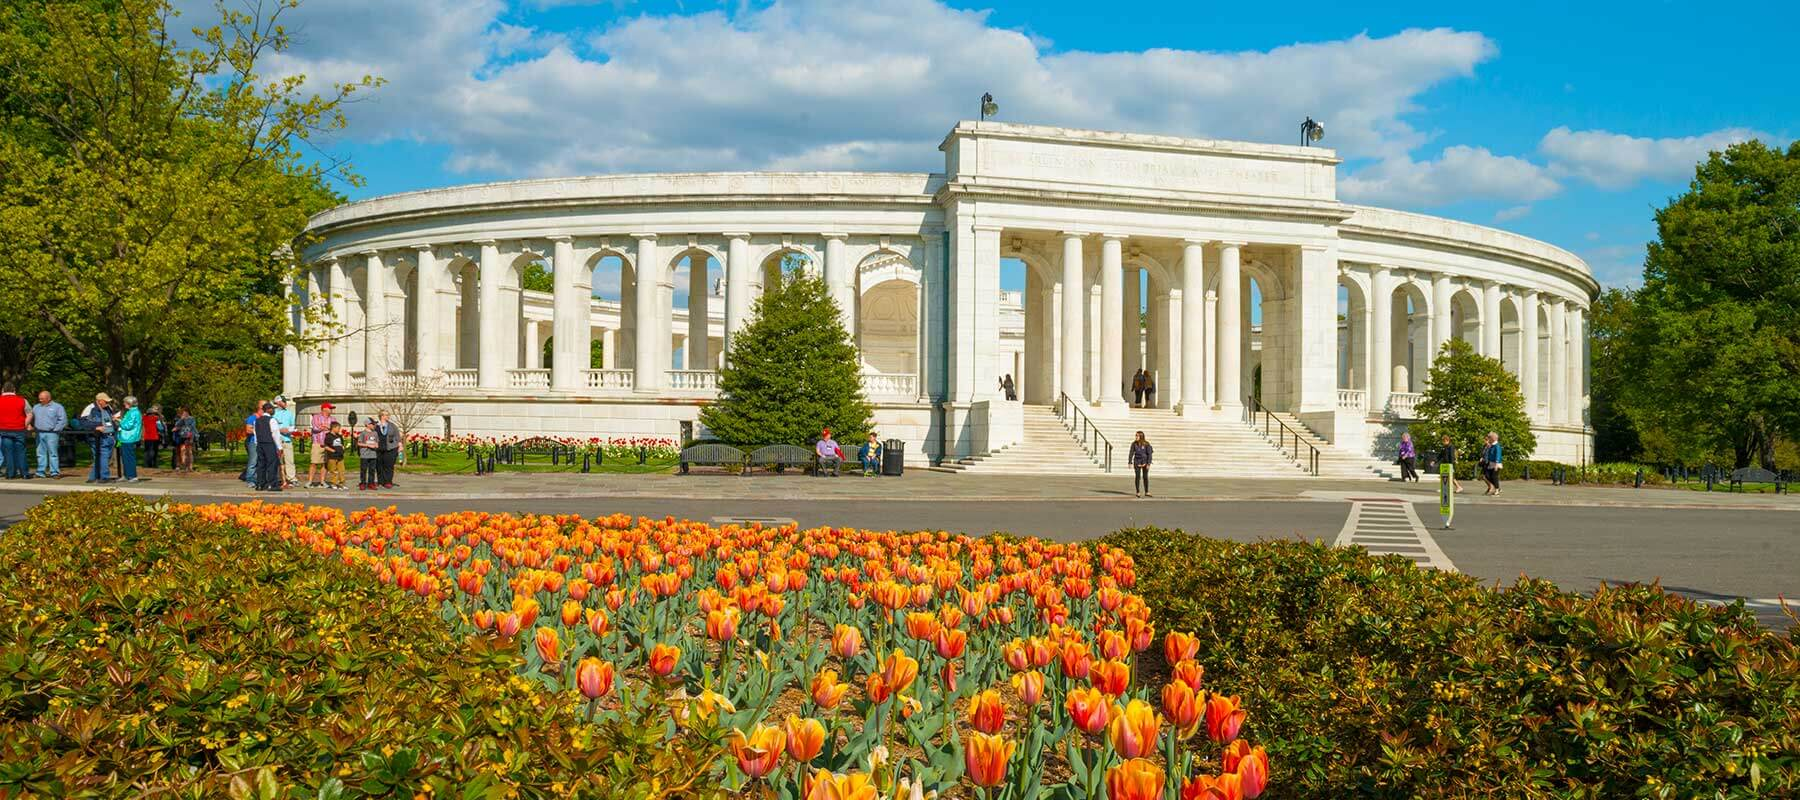 Arlington National Cemetery Tour Information